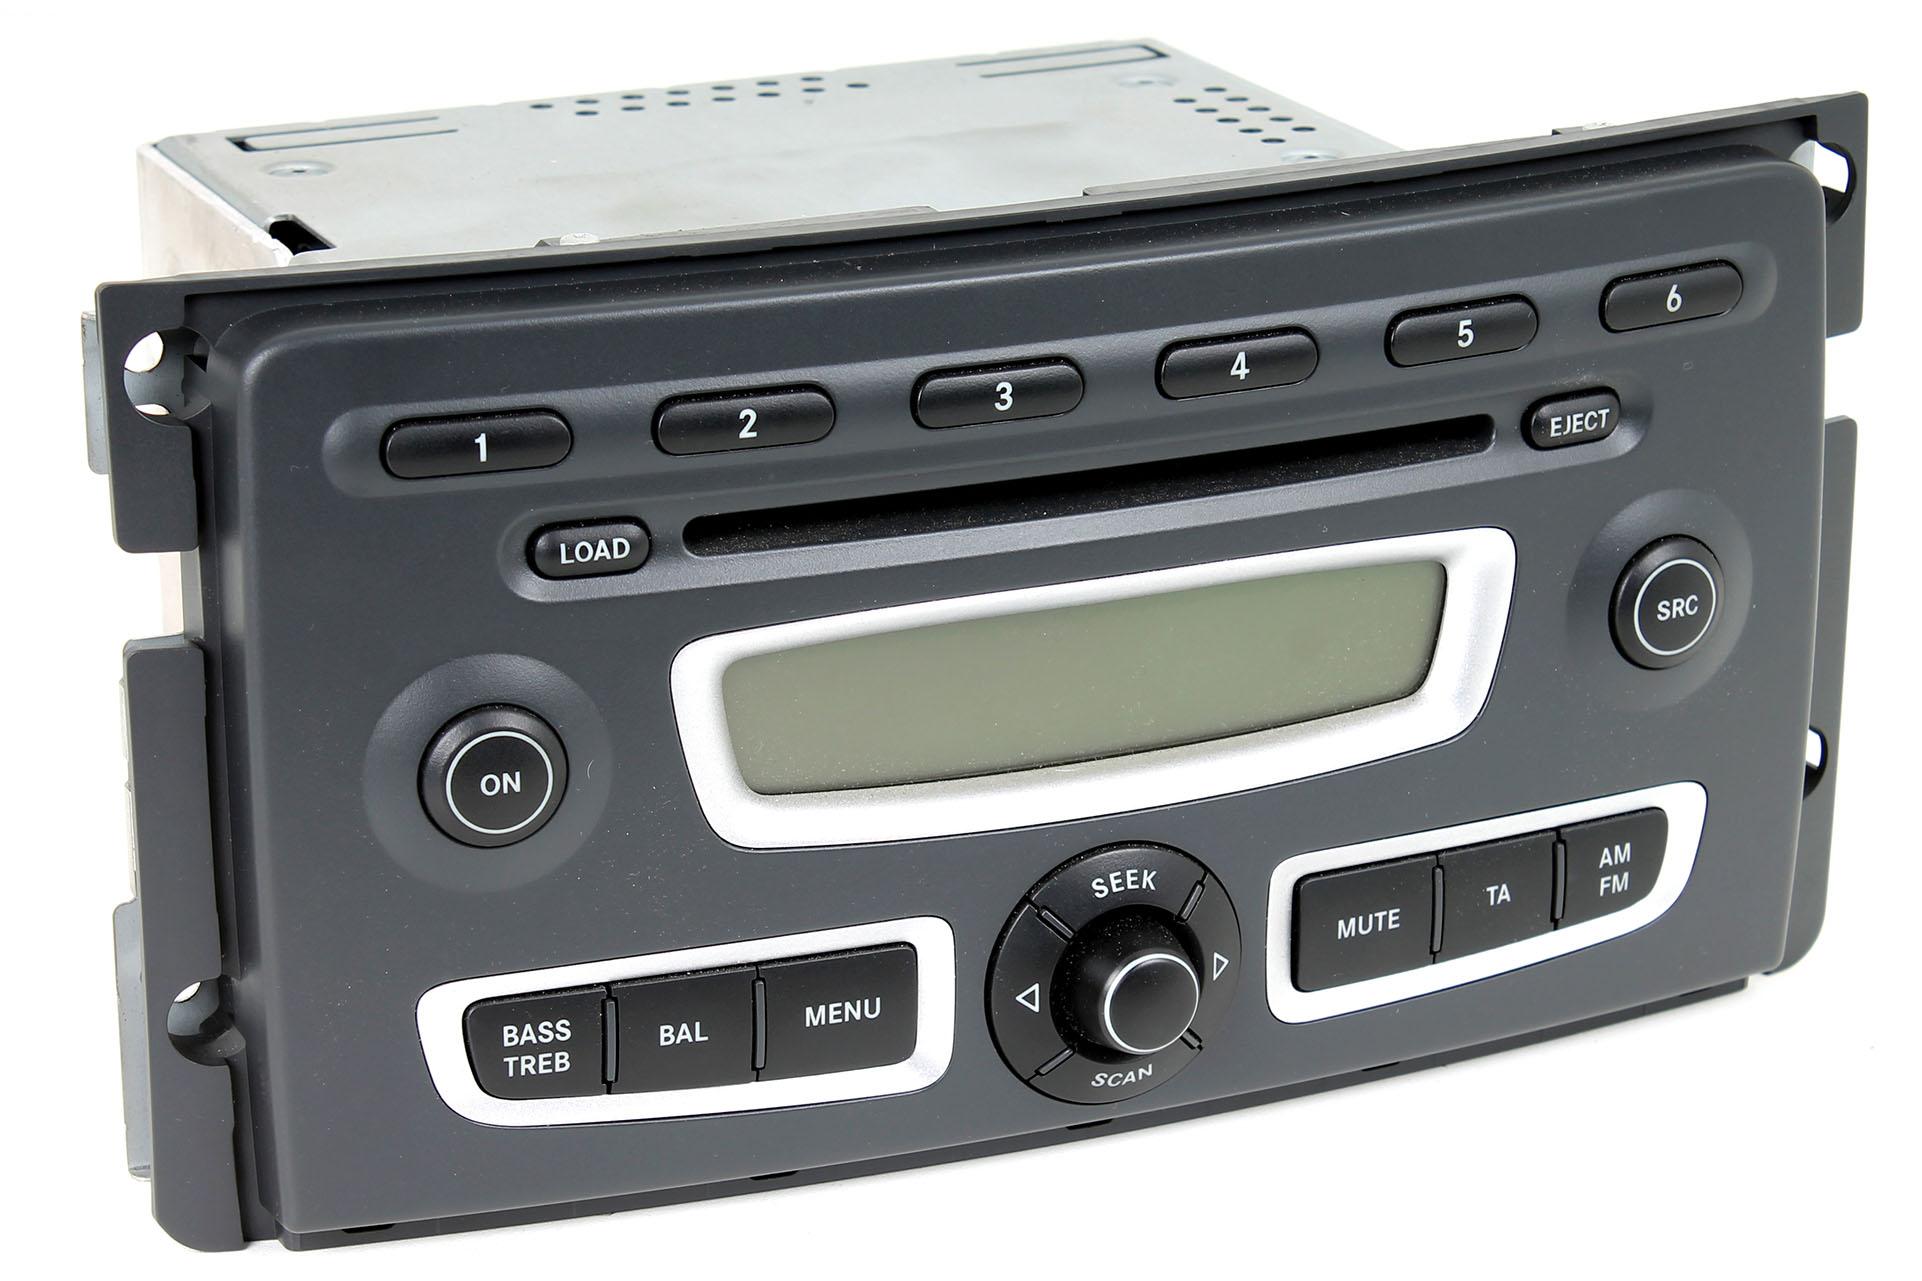 smart radio mit 6 fach cd wechsler a4518203679 mp3. Black Bedroom Furniture Sets. Home Design Ideas